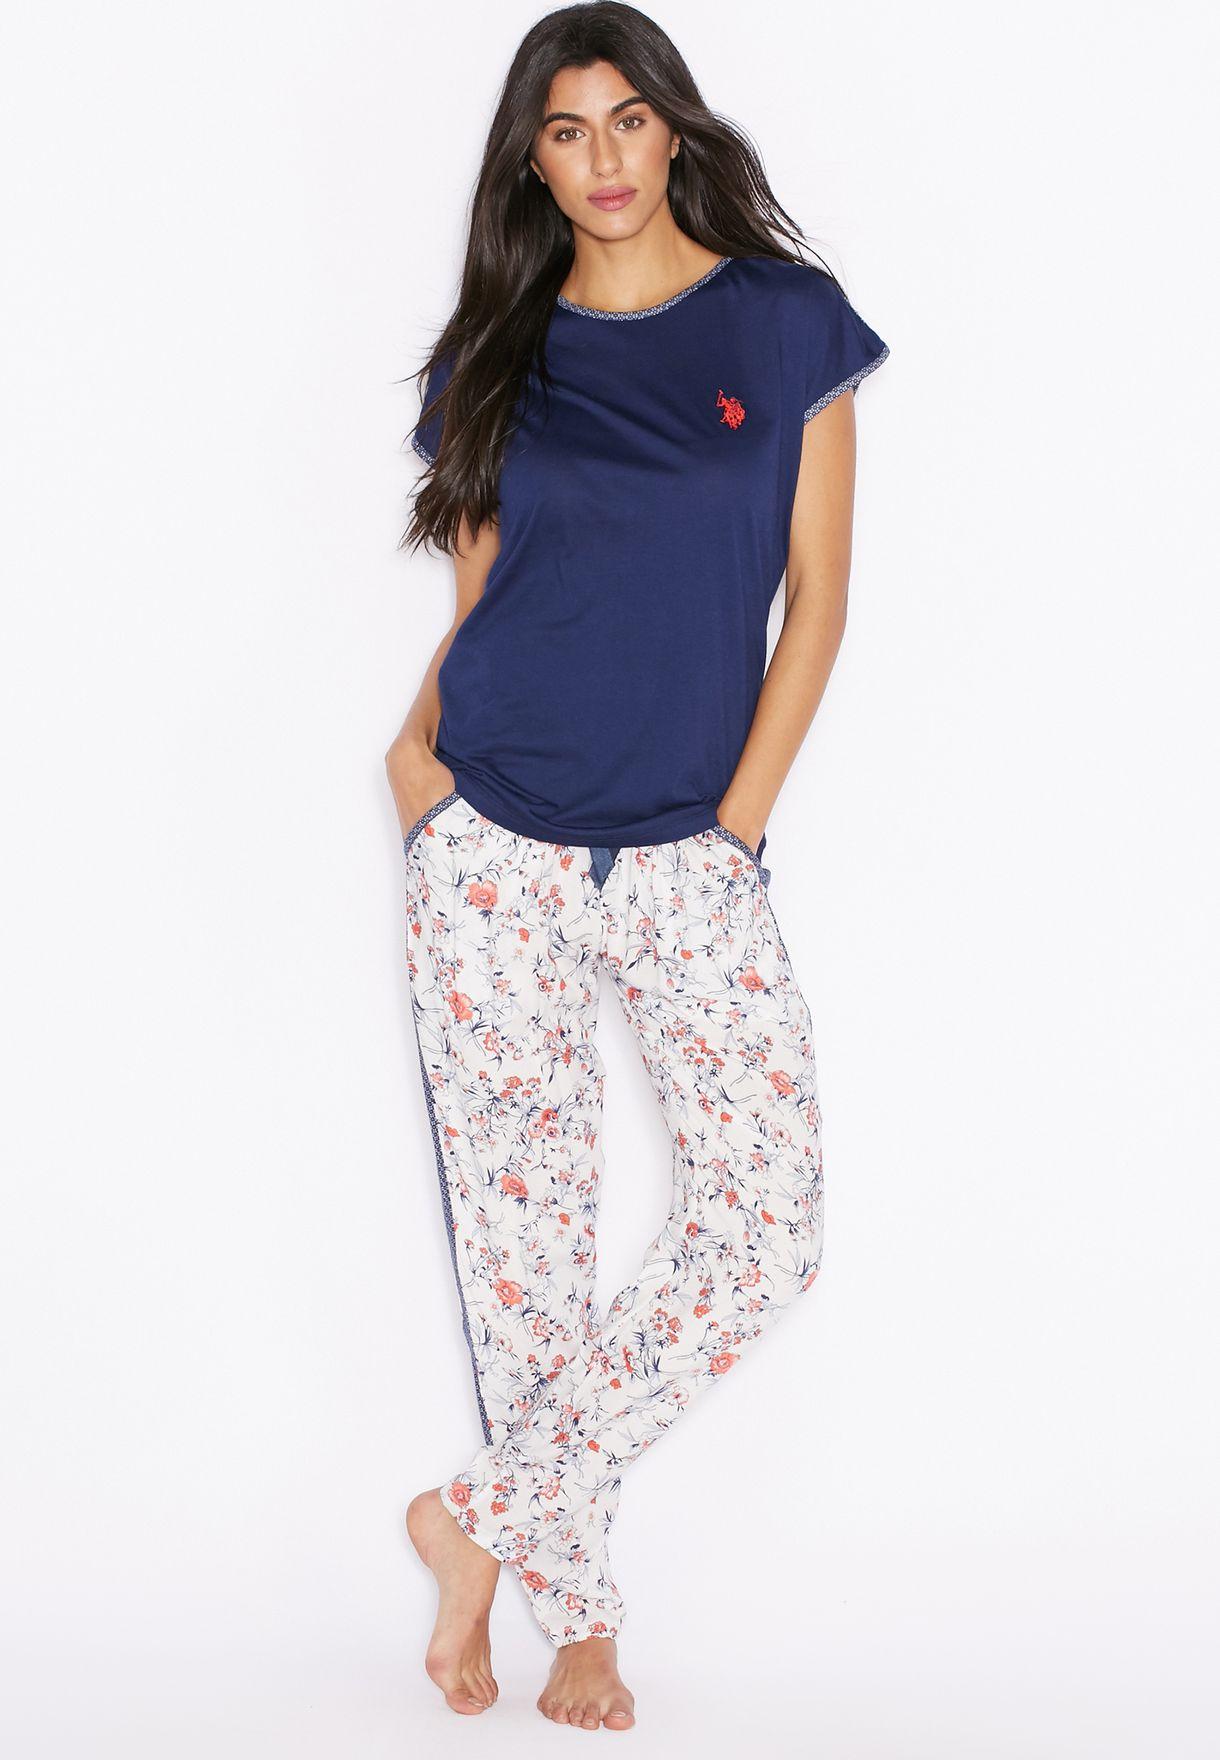 42cc5c7b1d387 Shop Us polo assn navy Printed Pyjama Set for Women in UAE ...